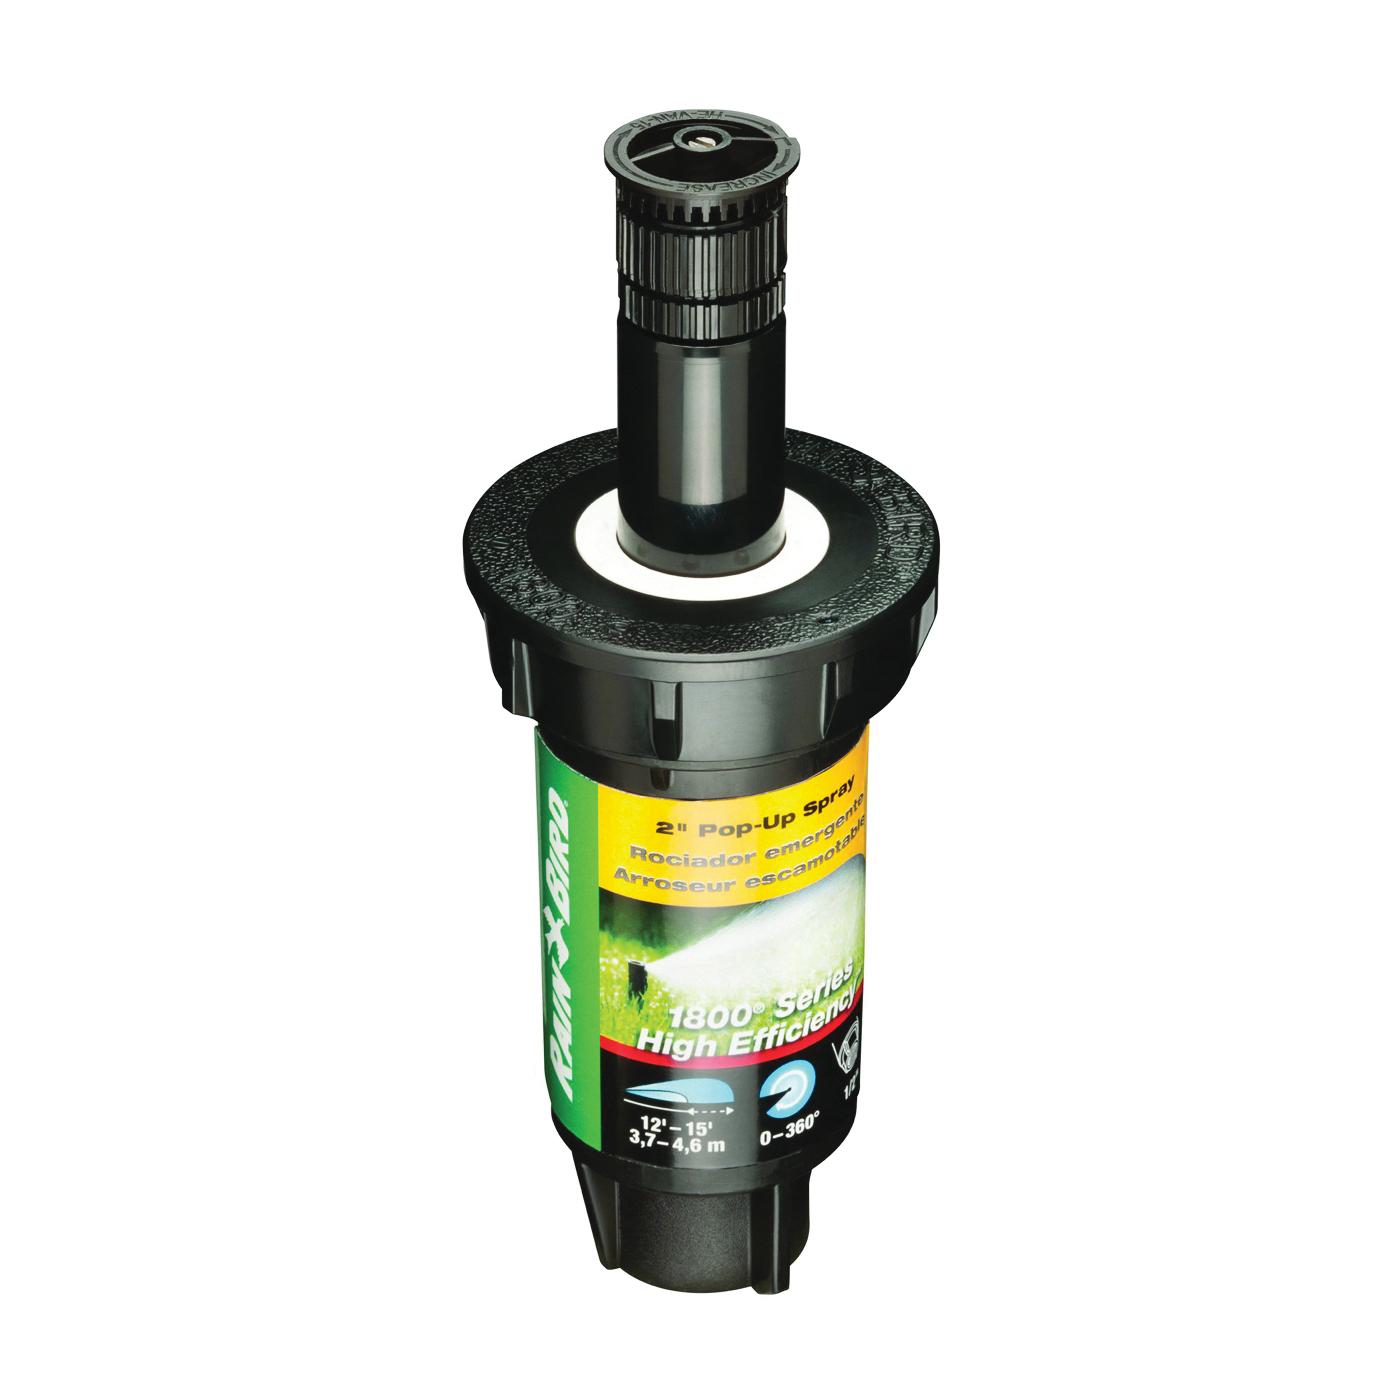 Picture of Rain Bird 1802HEVN15 Spray Head Sprinkler, 1/2 in Connection, FNPT, Plastic